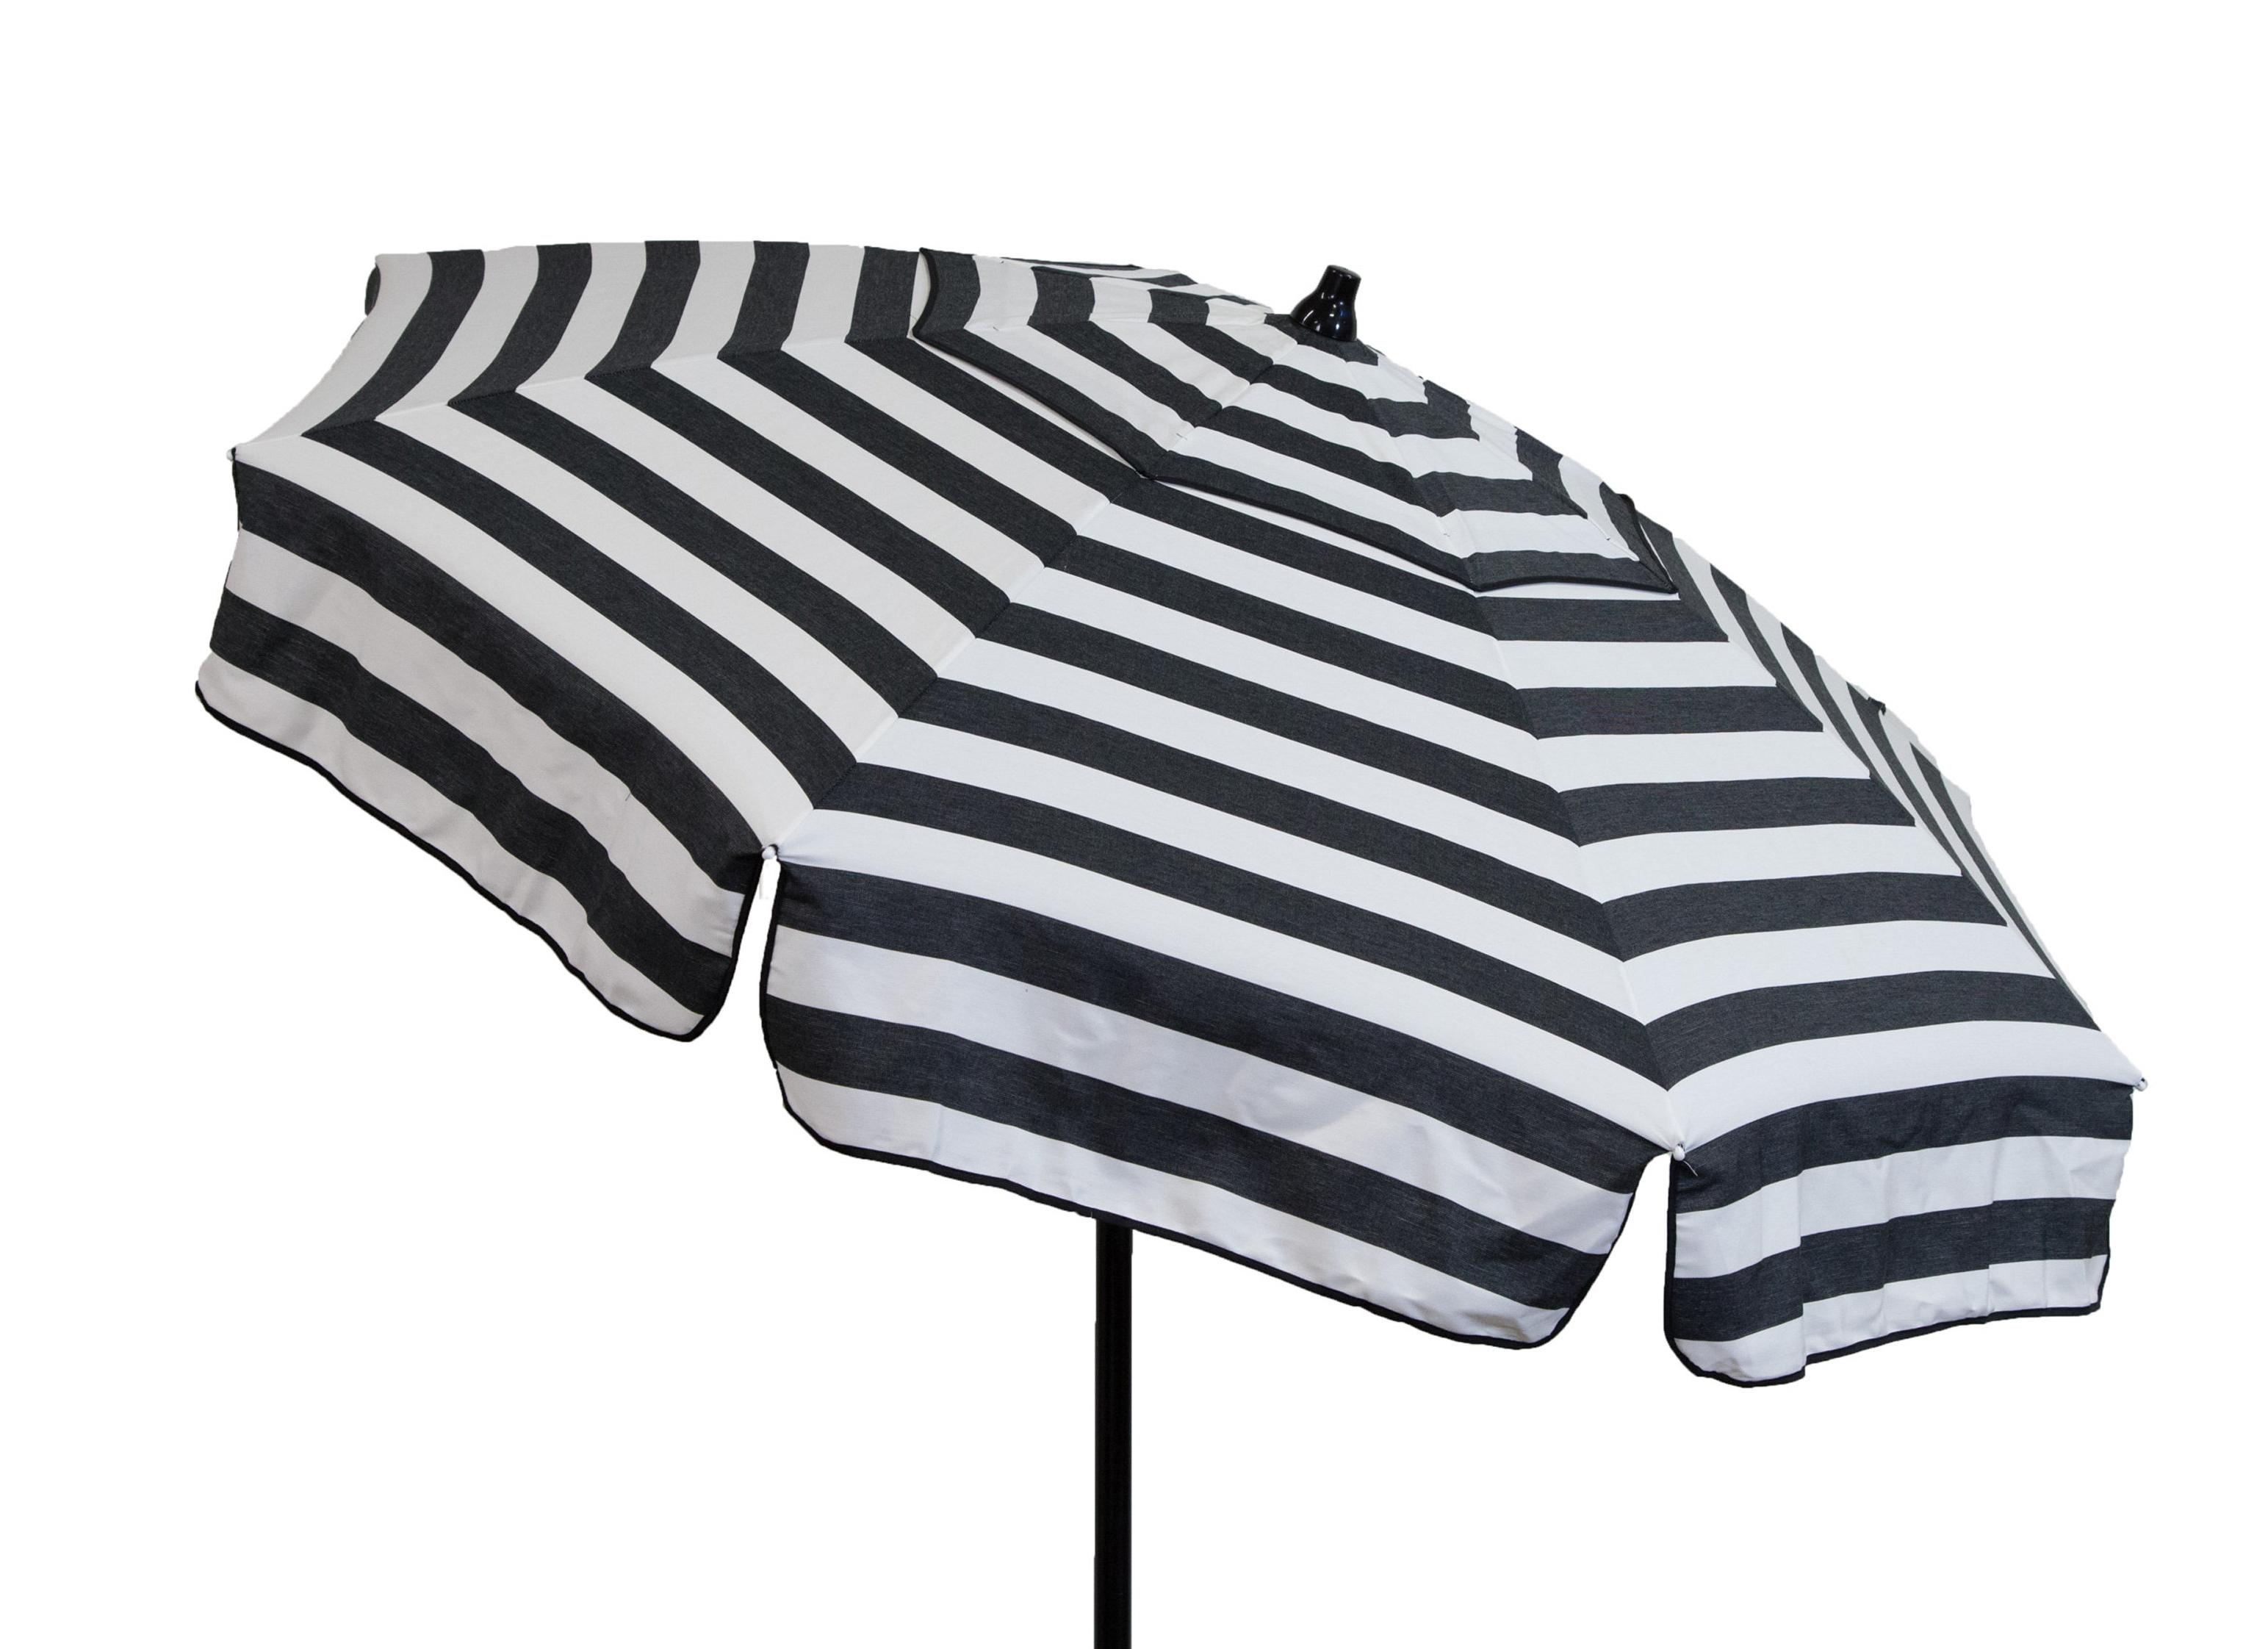 Most Current Italian 6' Drape Umbrella Inside Italian Drape Umbrellas (Gallery 7 of 20)